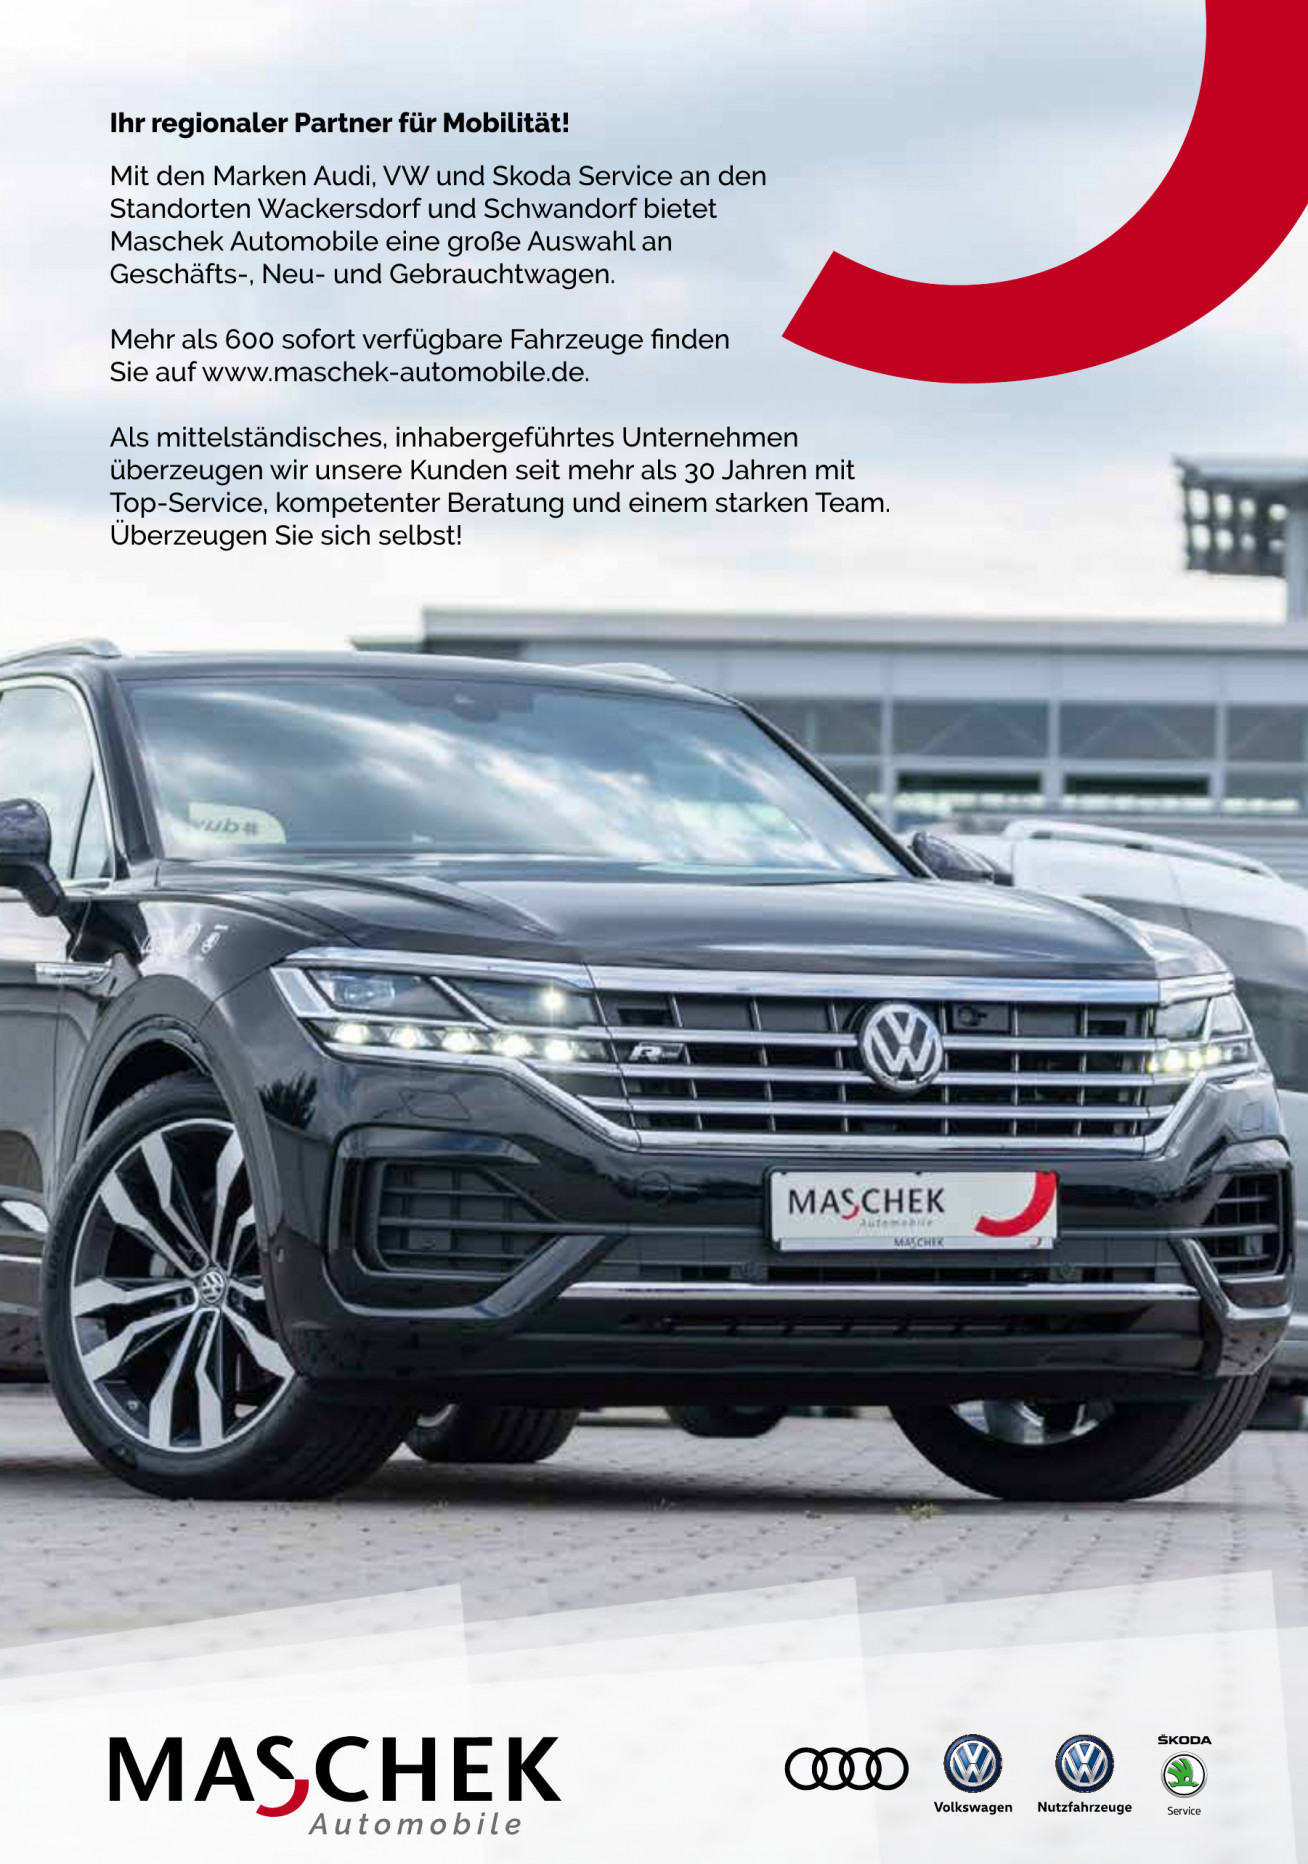 Maschek Automobile GmbH & Co.KG